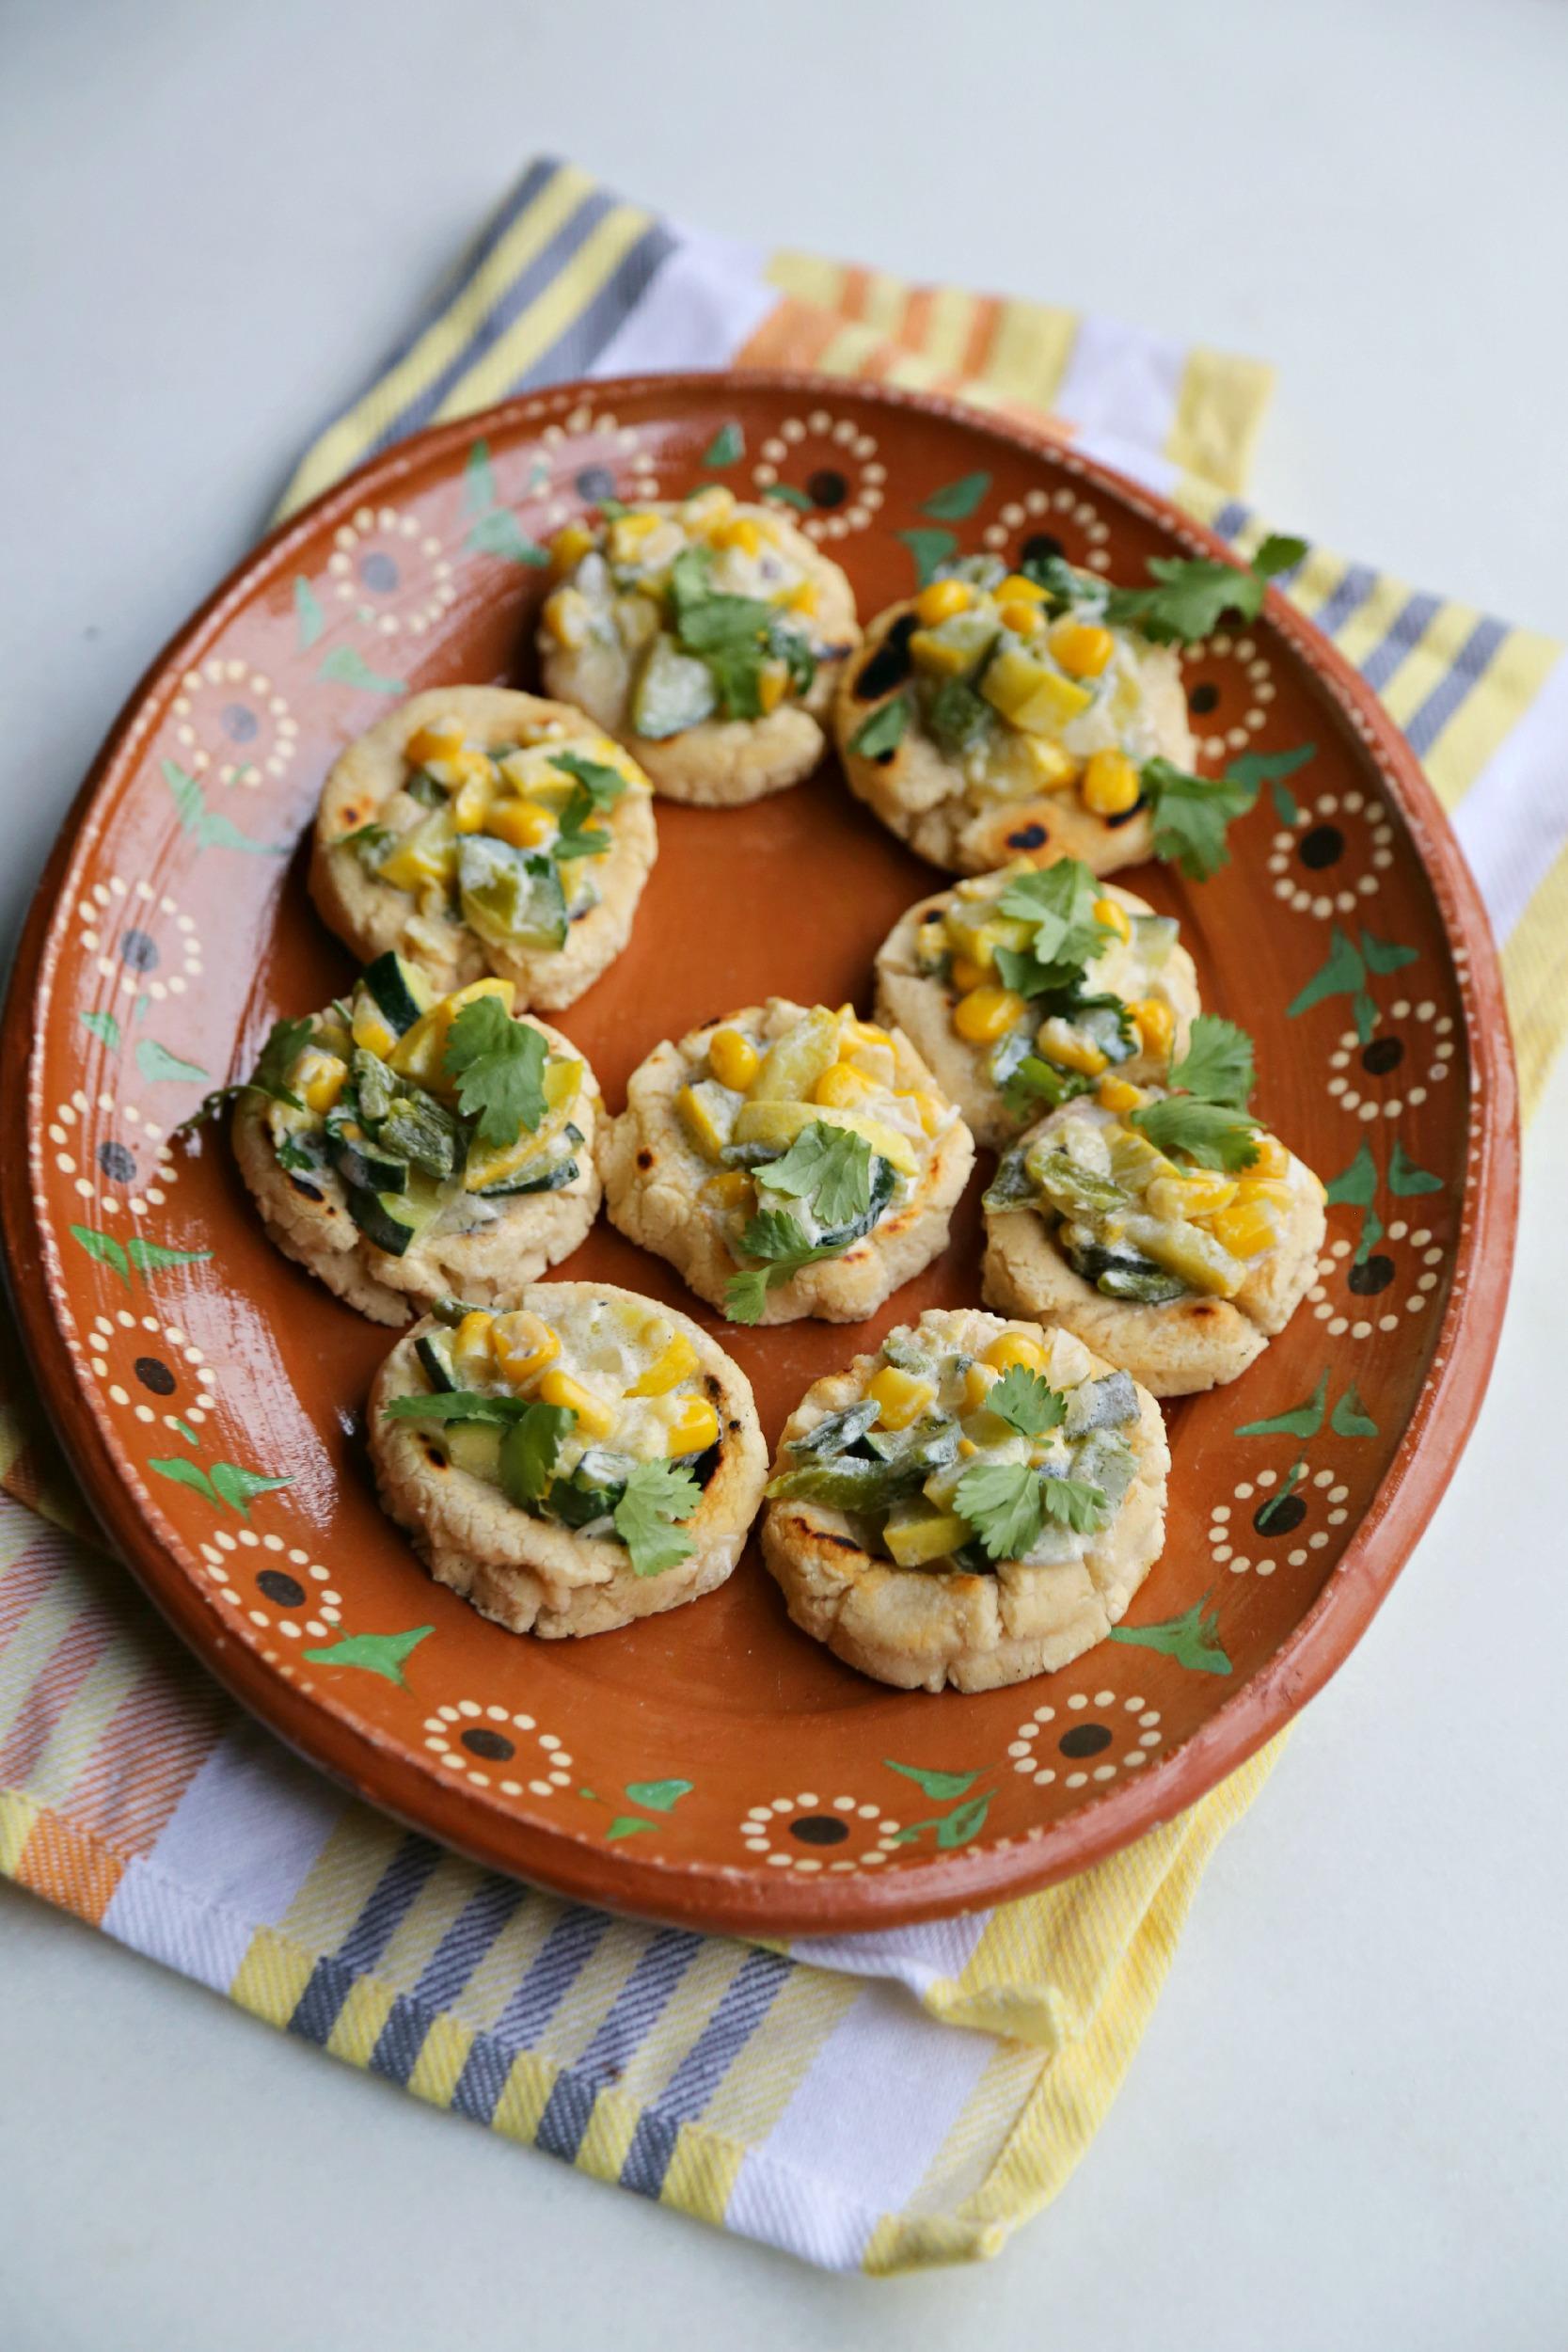 mini-sopes-topped-with-calabacitas-con-crema-vianneyrodriguez-sweetlifebake